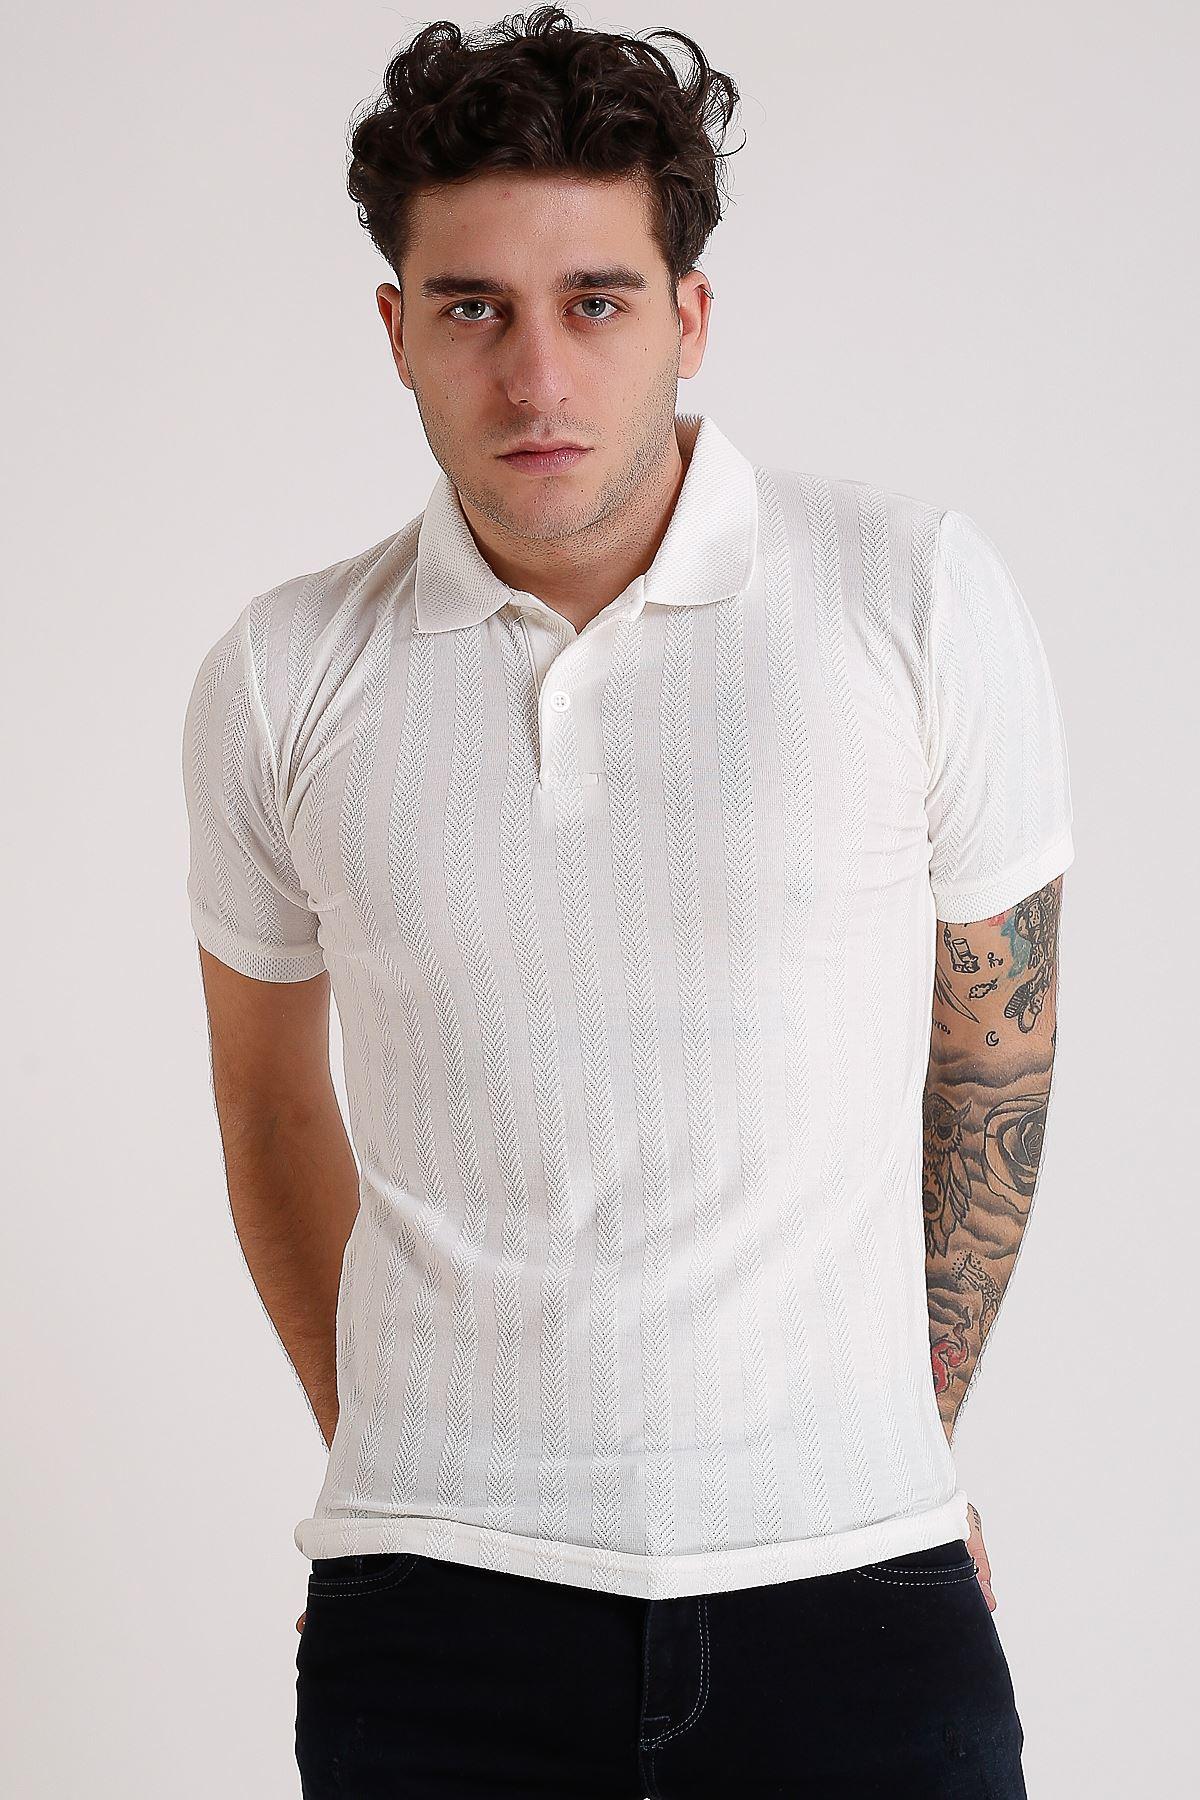 Erkek Polo yaka Örme Beyaz T-Shirt